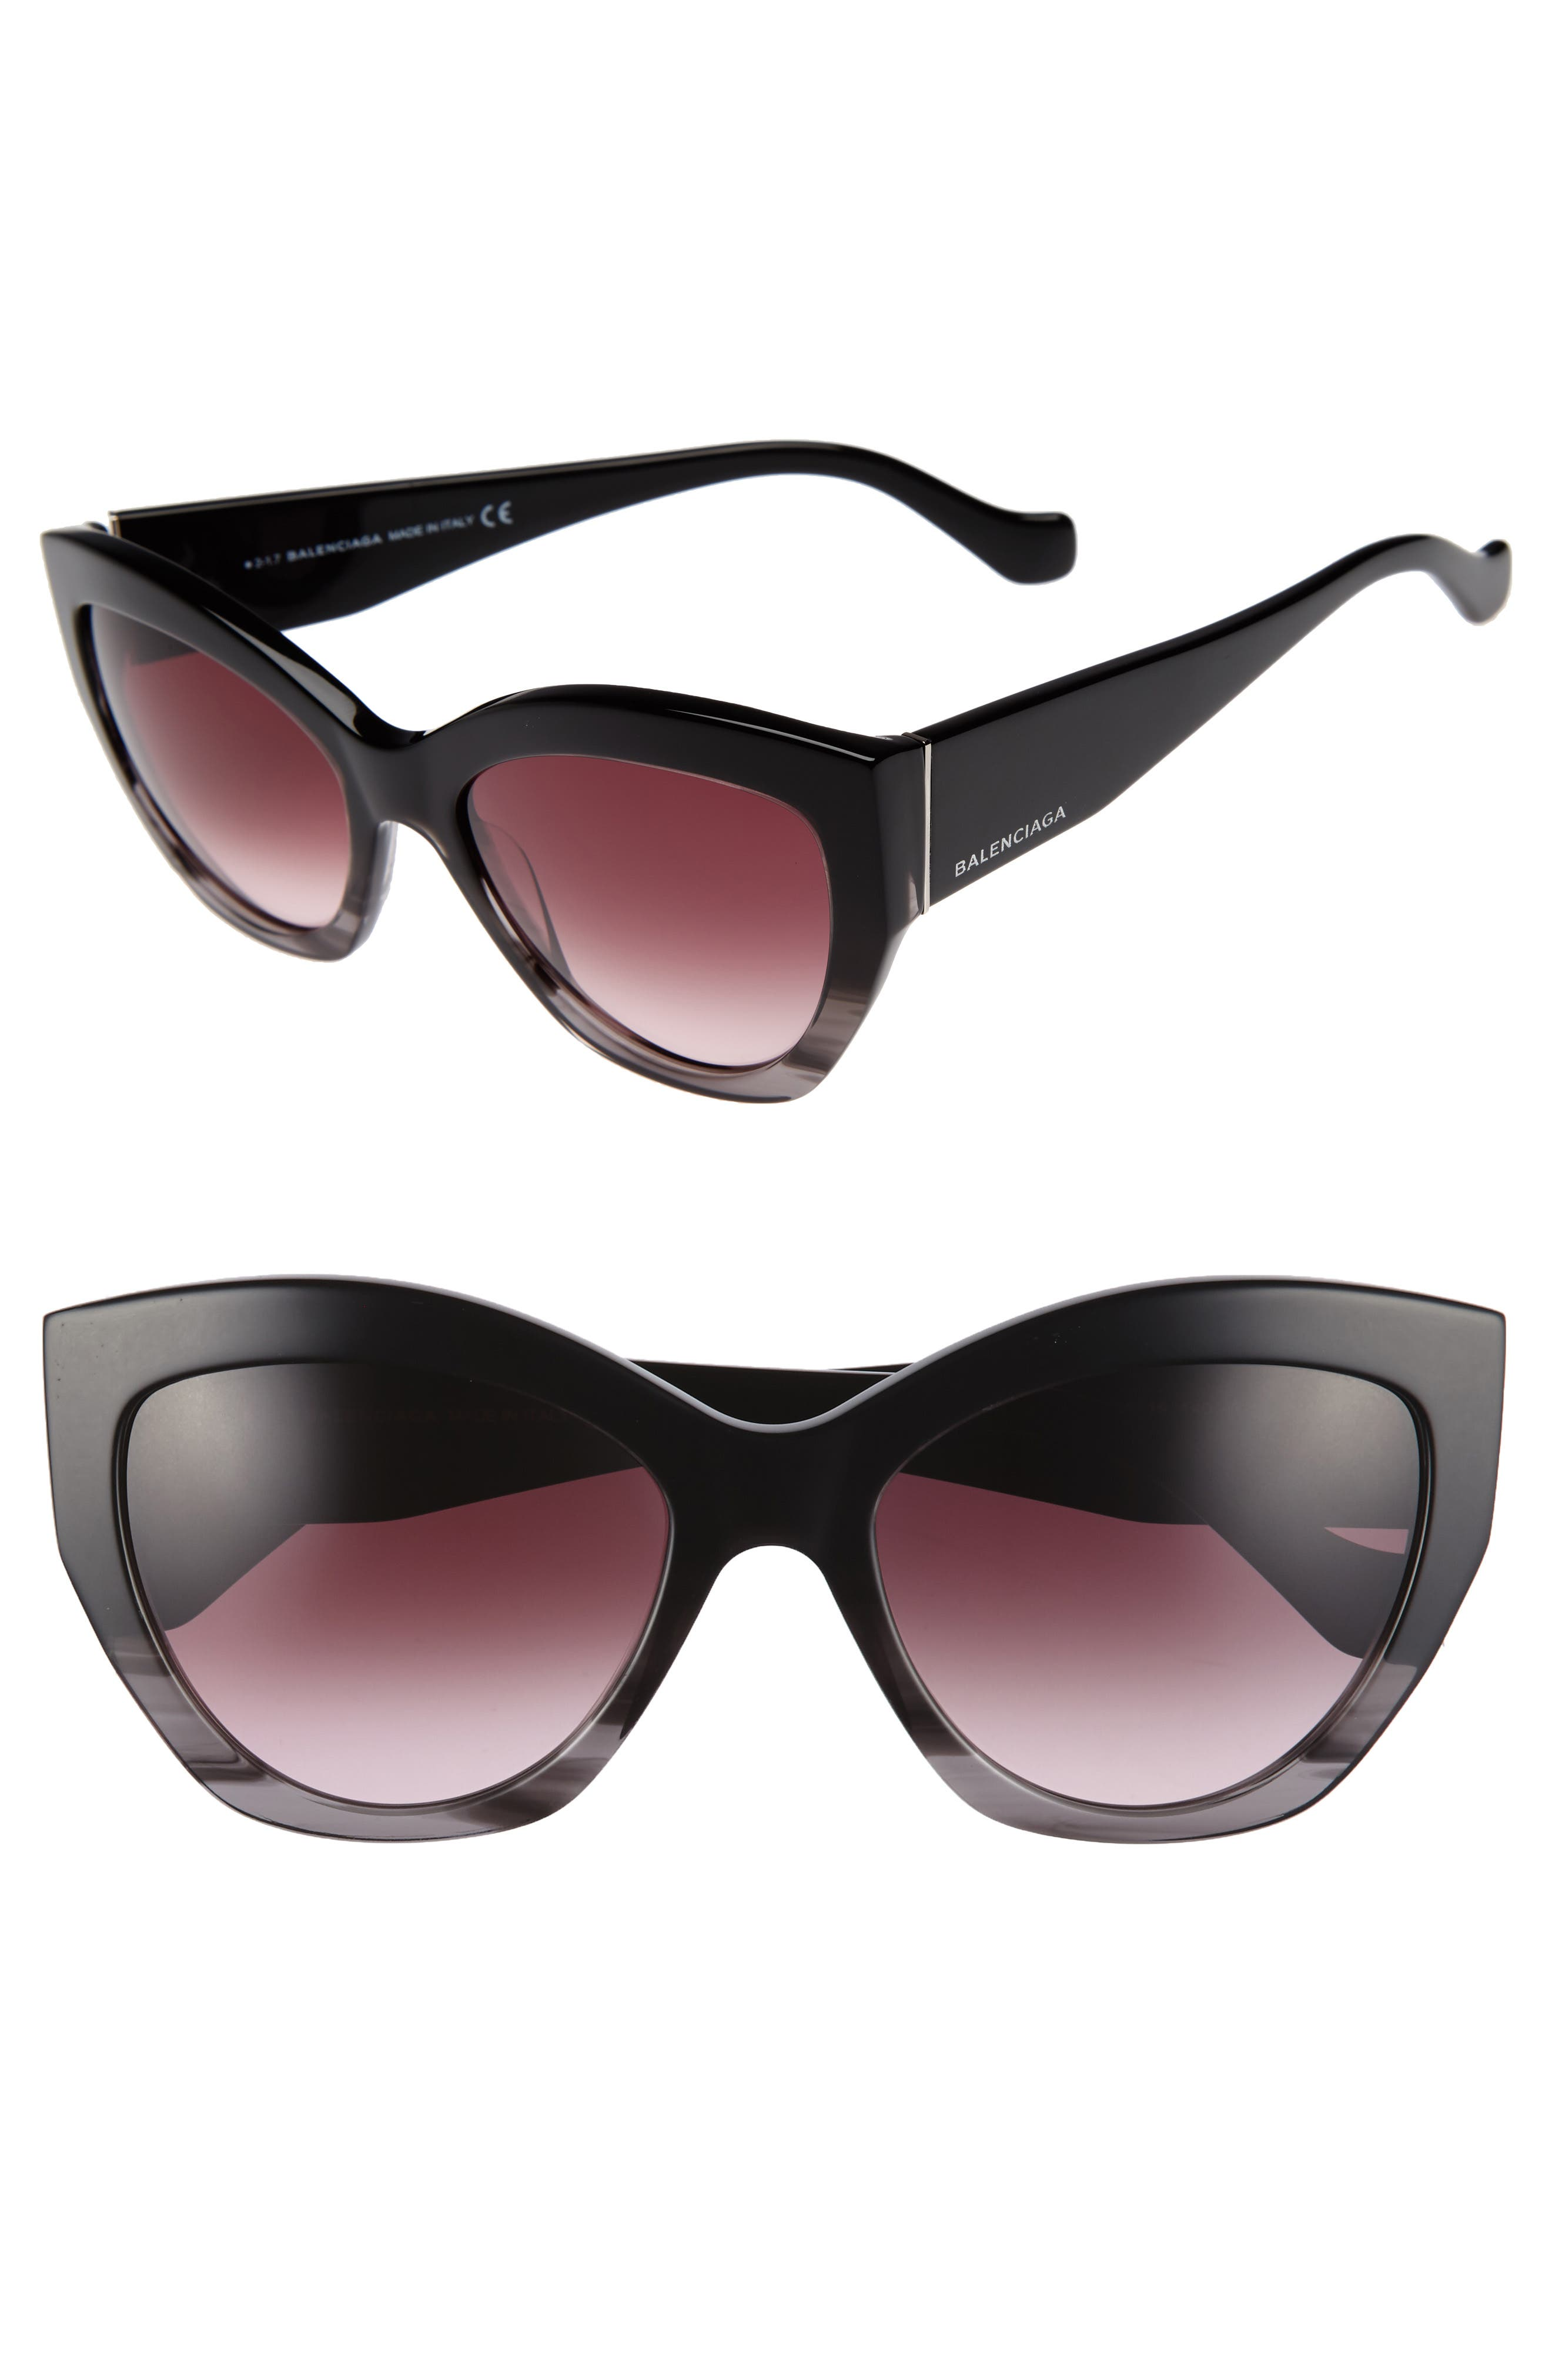 56mm Cat Eye Sunglasses,                             Main thumbnail 1, color,                             001